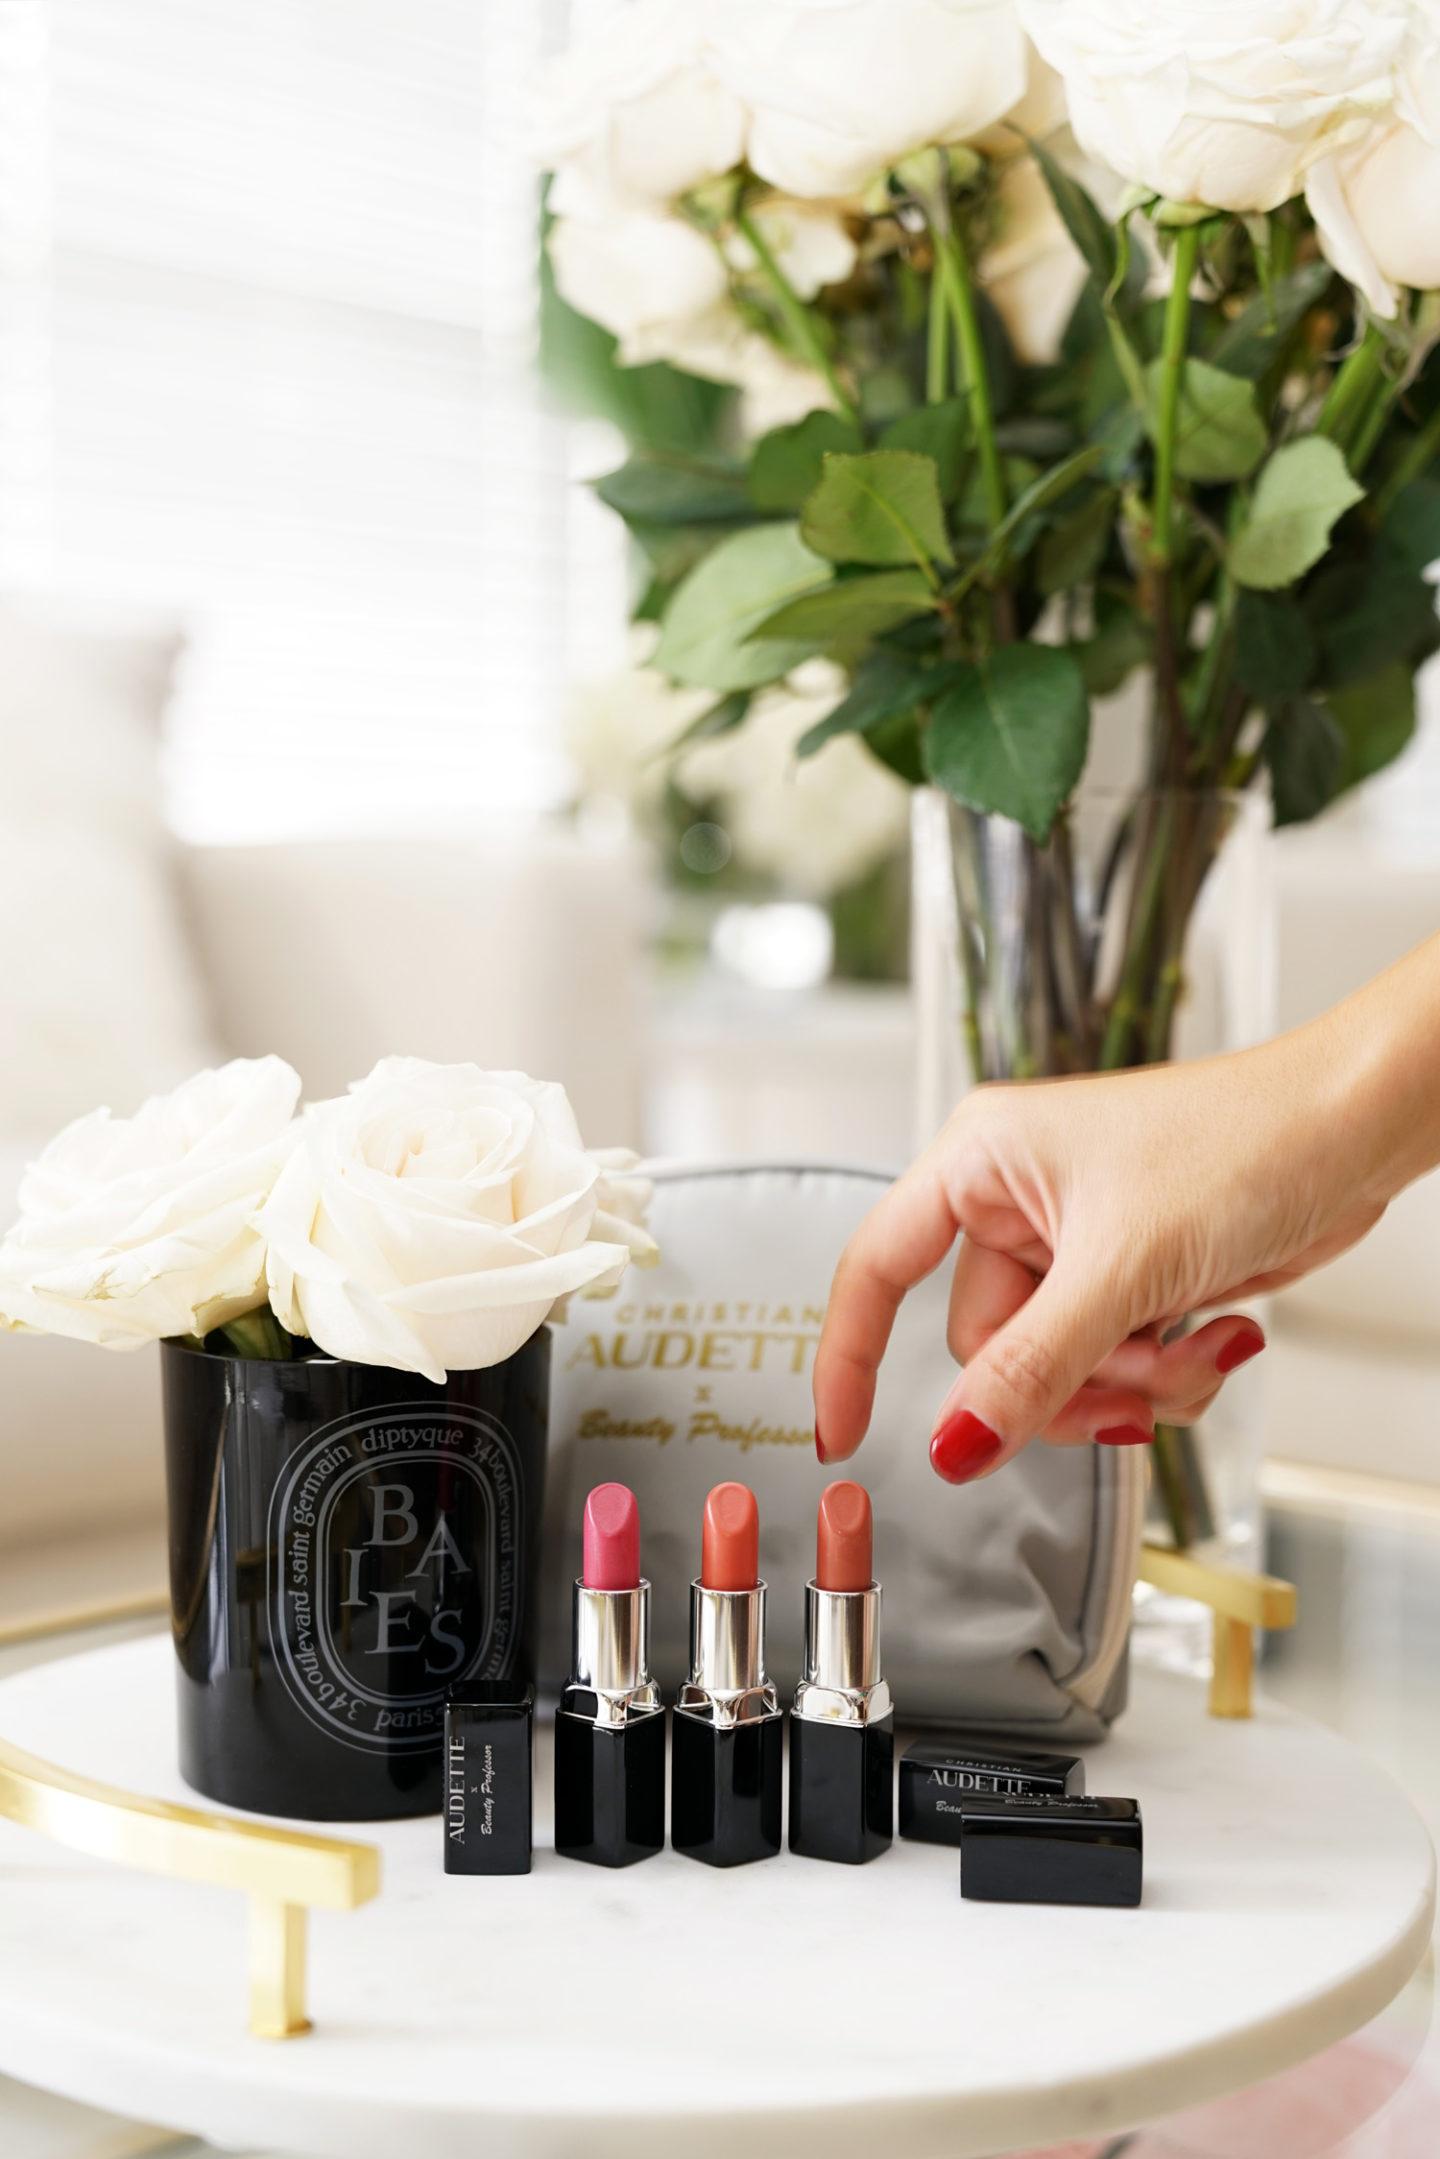 Christian Audette Beauty Professor Lipstick Collection